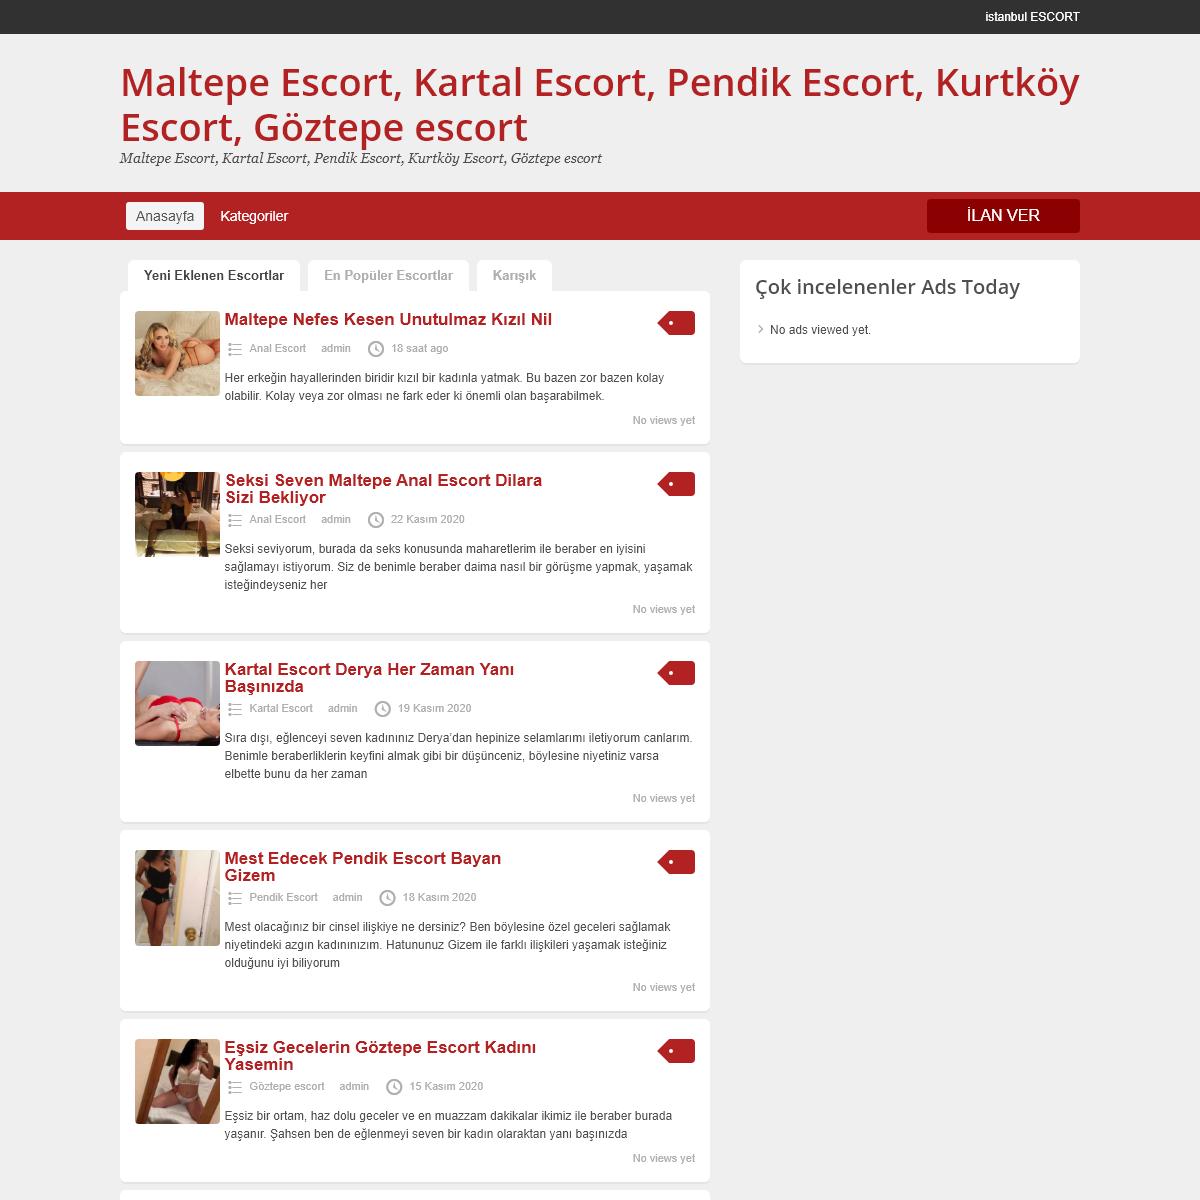 Maltepe Escort, Kartal Escort, Pendik Escort, Kurtköy Escort, Göztepe escort